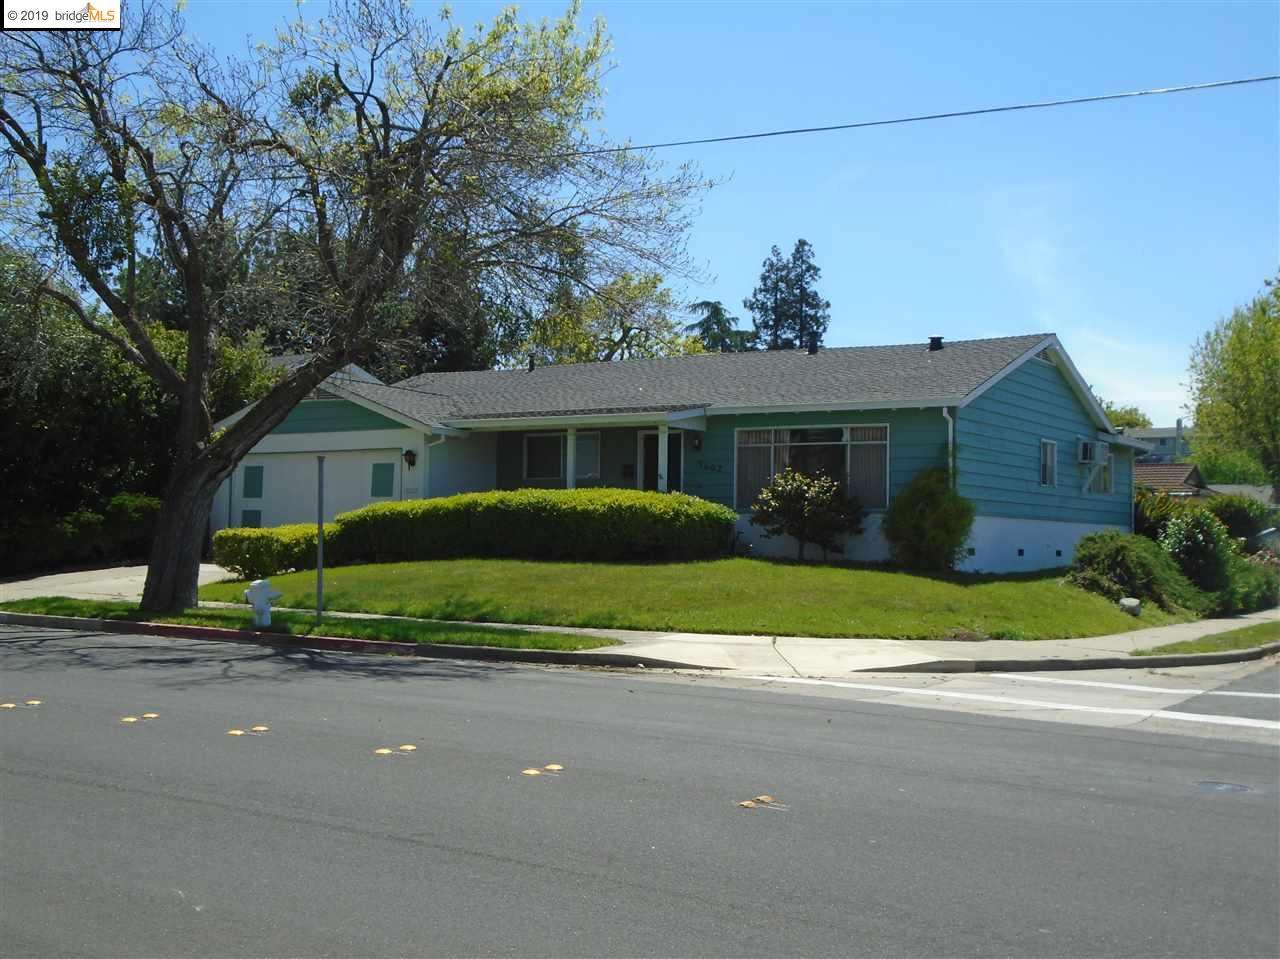 3602 Longview Rd, ANTIOCH, CA 94509